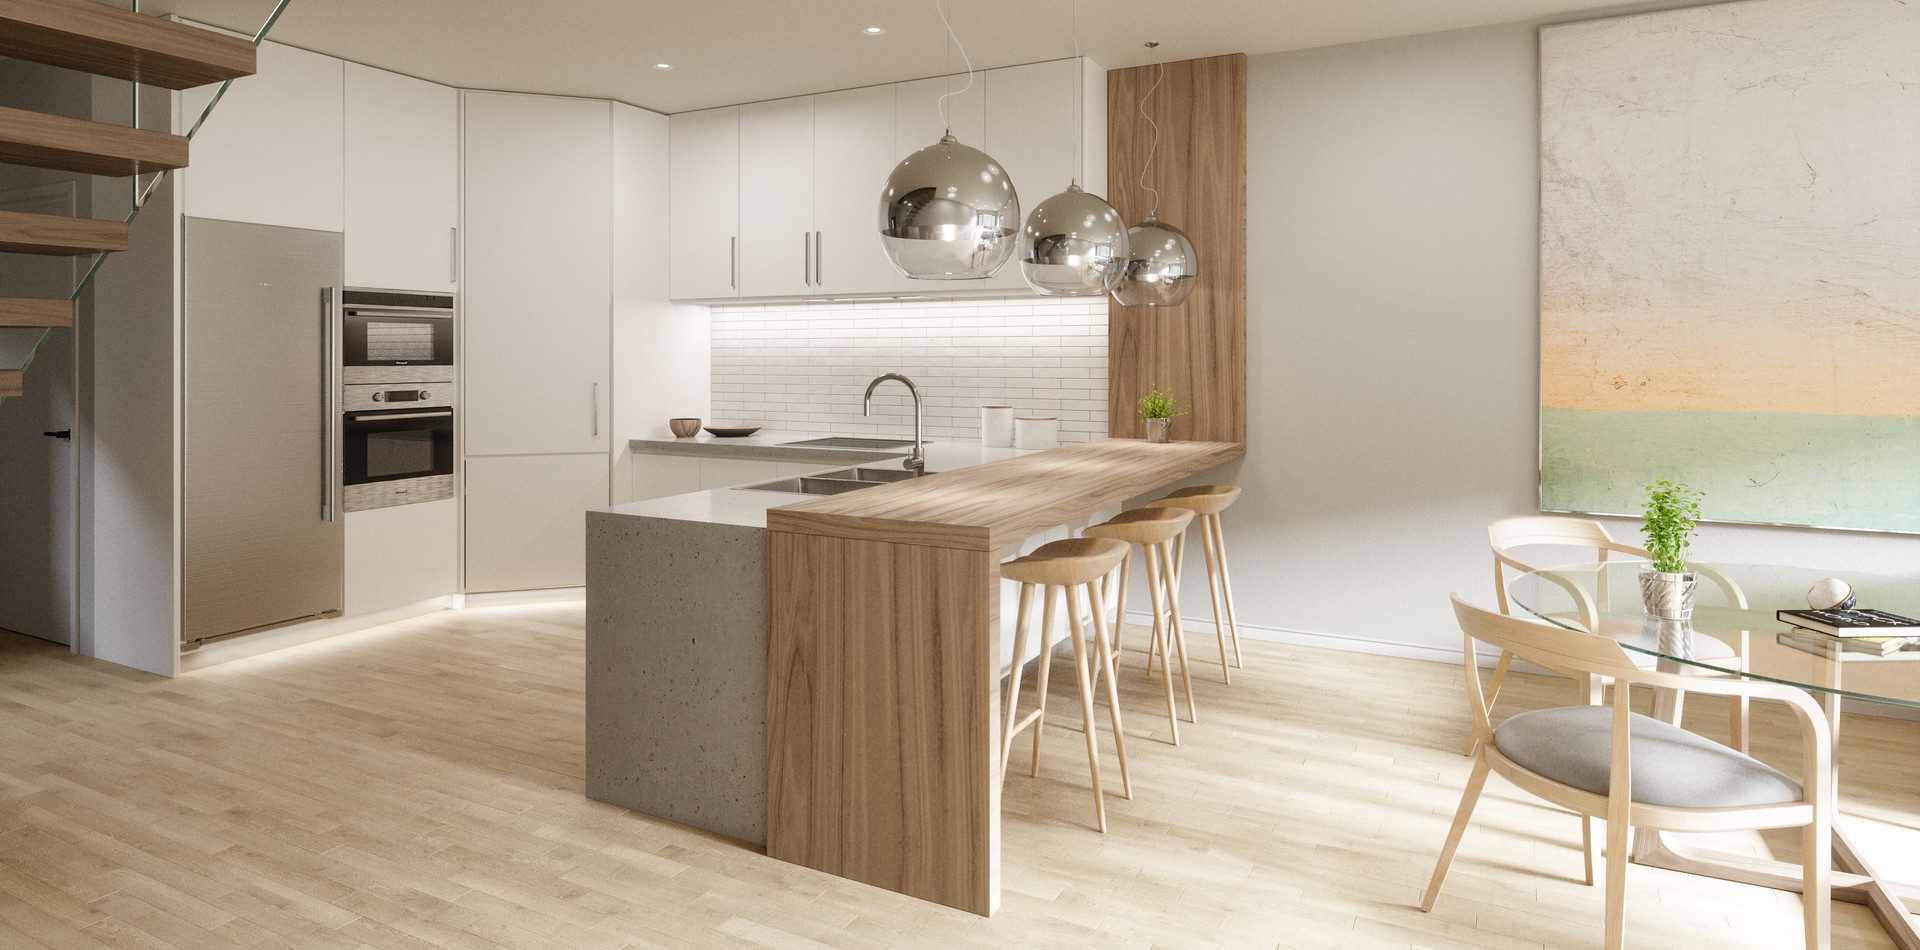 Braybrooke Kitchen Light 4K.jpg